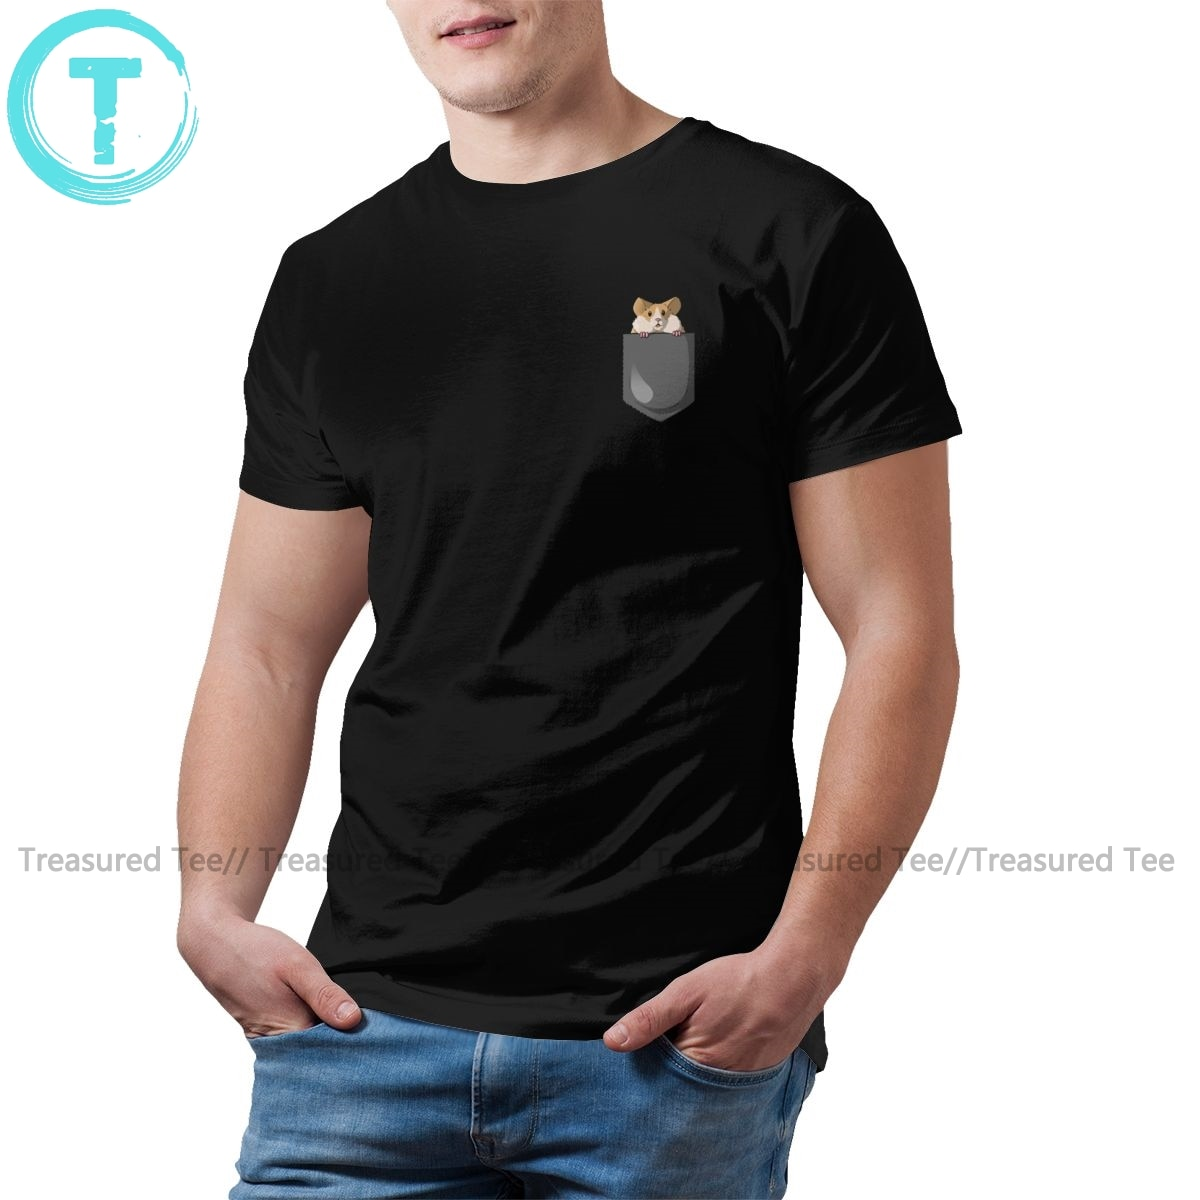 Camiseta hámster, camiseta de hámster, camiseta para hombre de gran tamaño, camiseta 100 de algodón de manga corta, Camiseta básica estampada